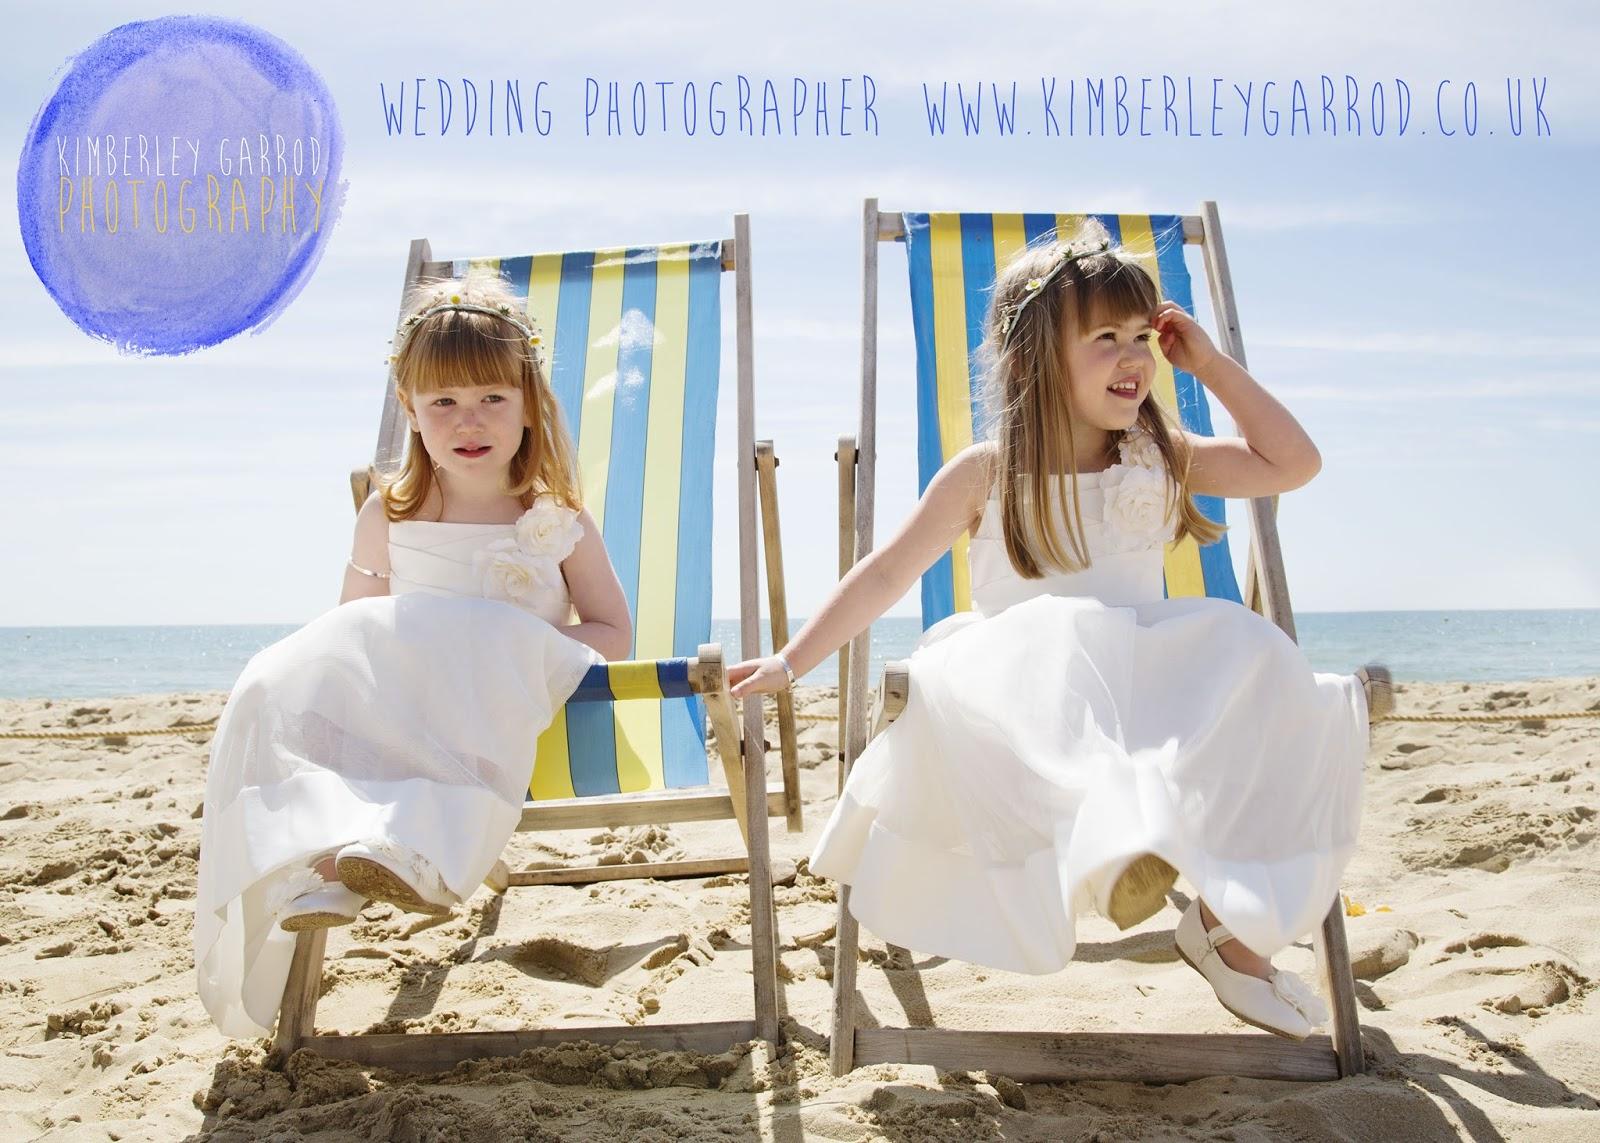 Beach Weddings Bournemouth Wedding Photographer